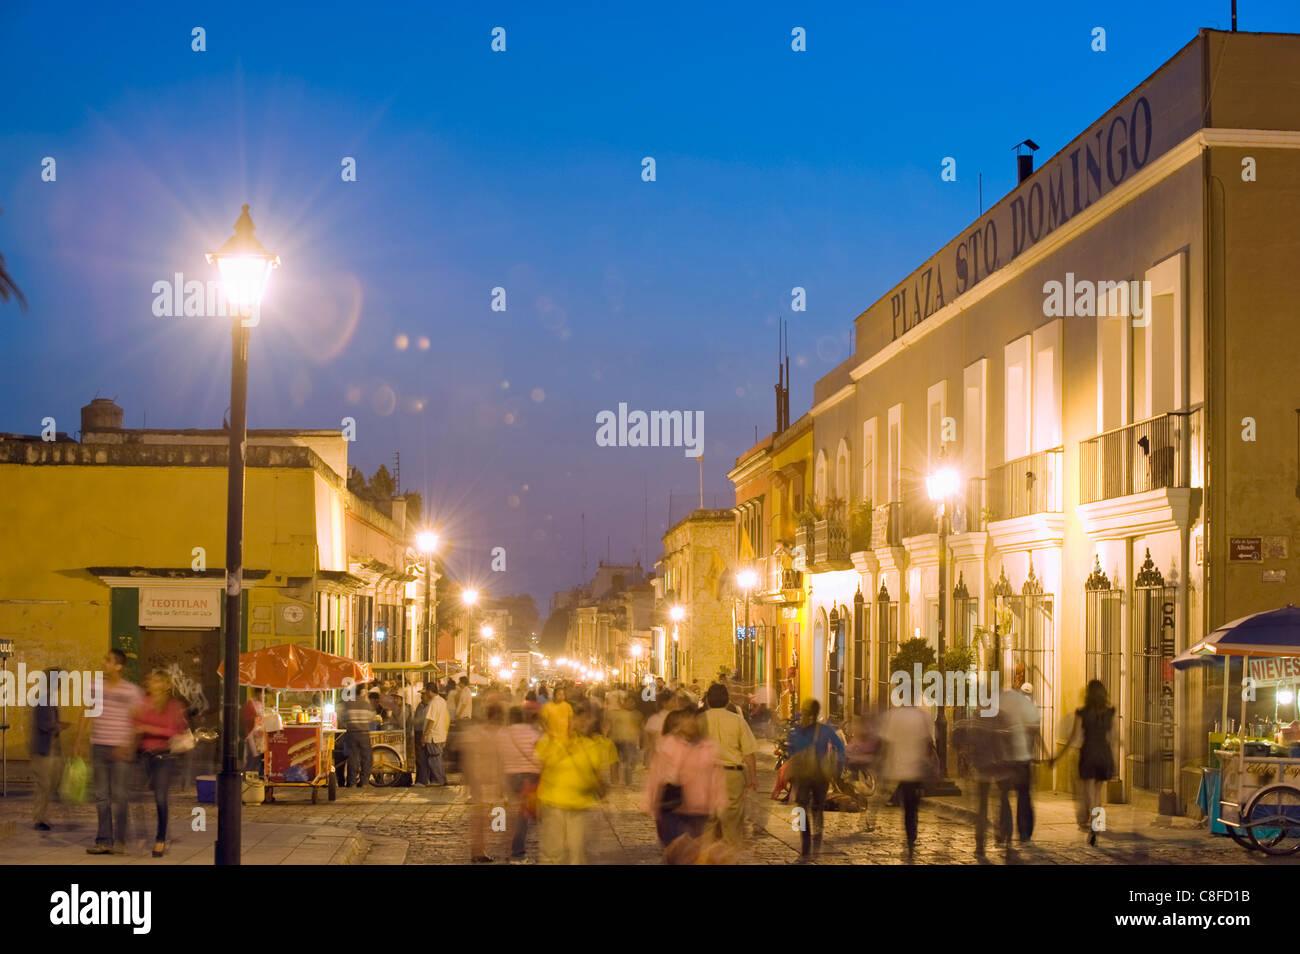 Nightime street scene, Oaxaca, Oaxaca state, Mexico - Stock Image